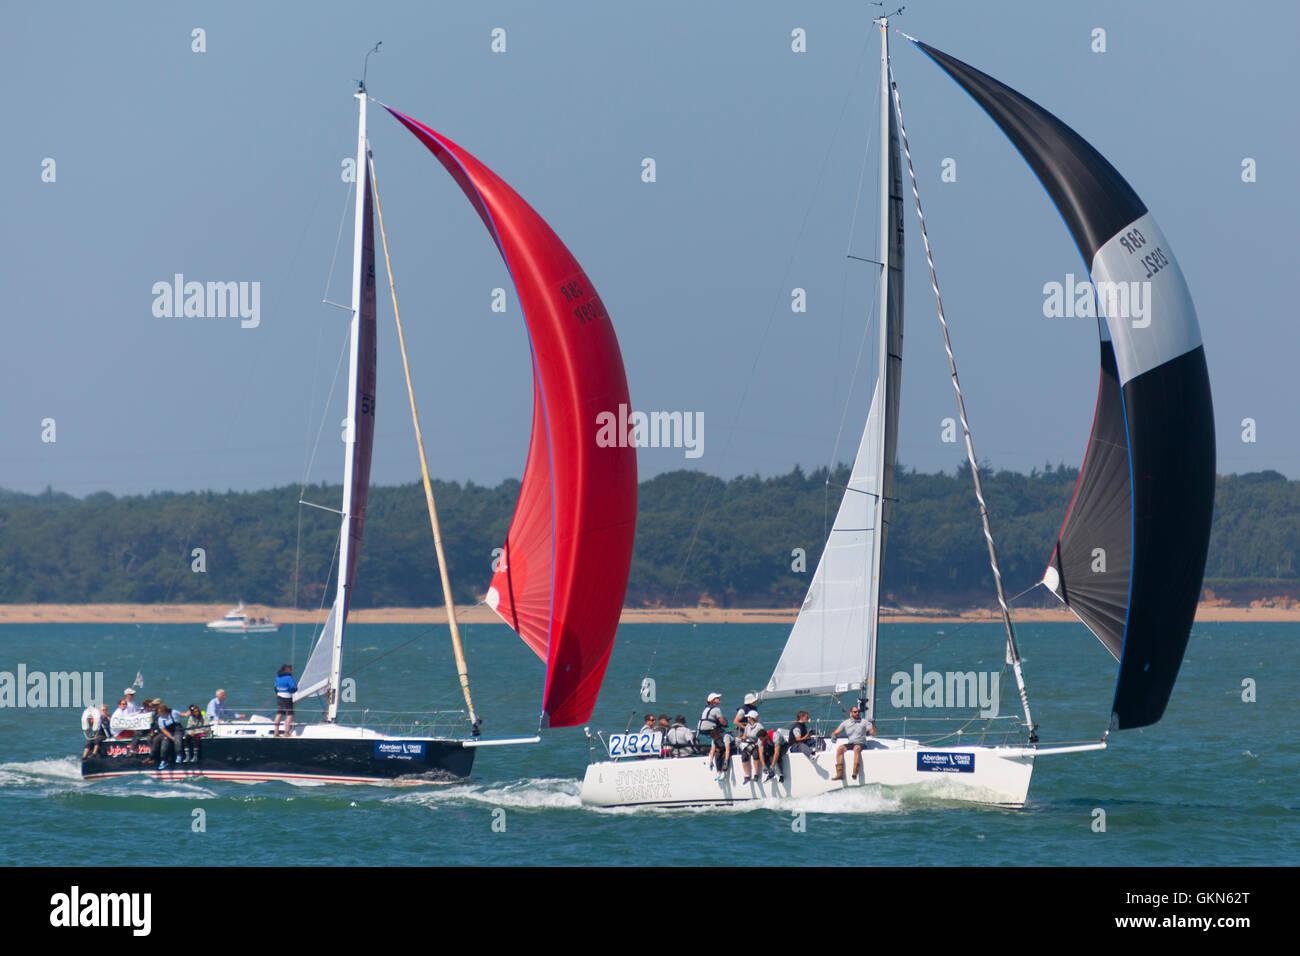 Tonnerre et Breskins Yes  Boat yacht racing Artemis spinnaker run race boat Cowes Week Isle of Wight UK bouy navigation - Stock Image